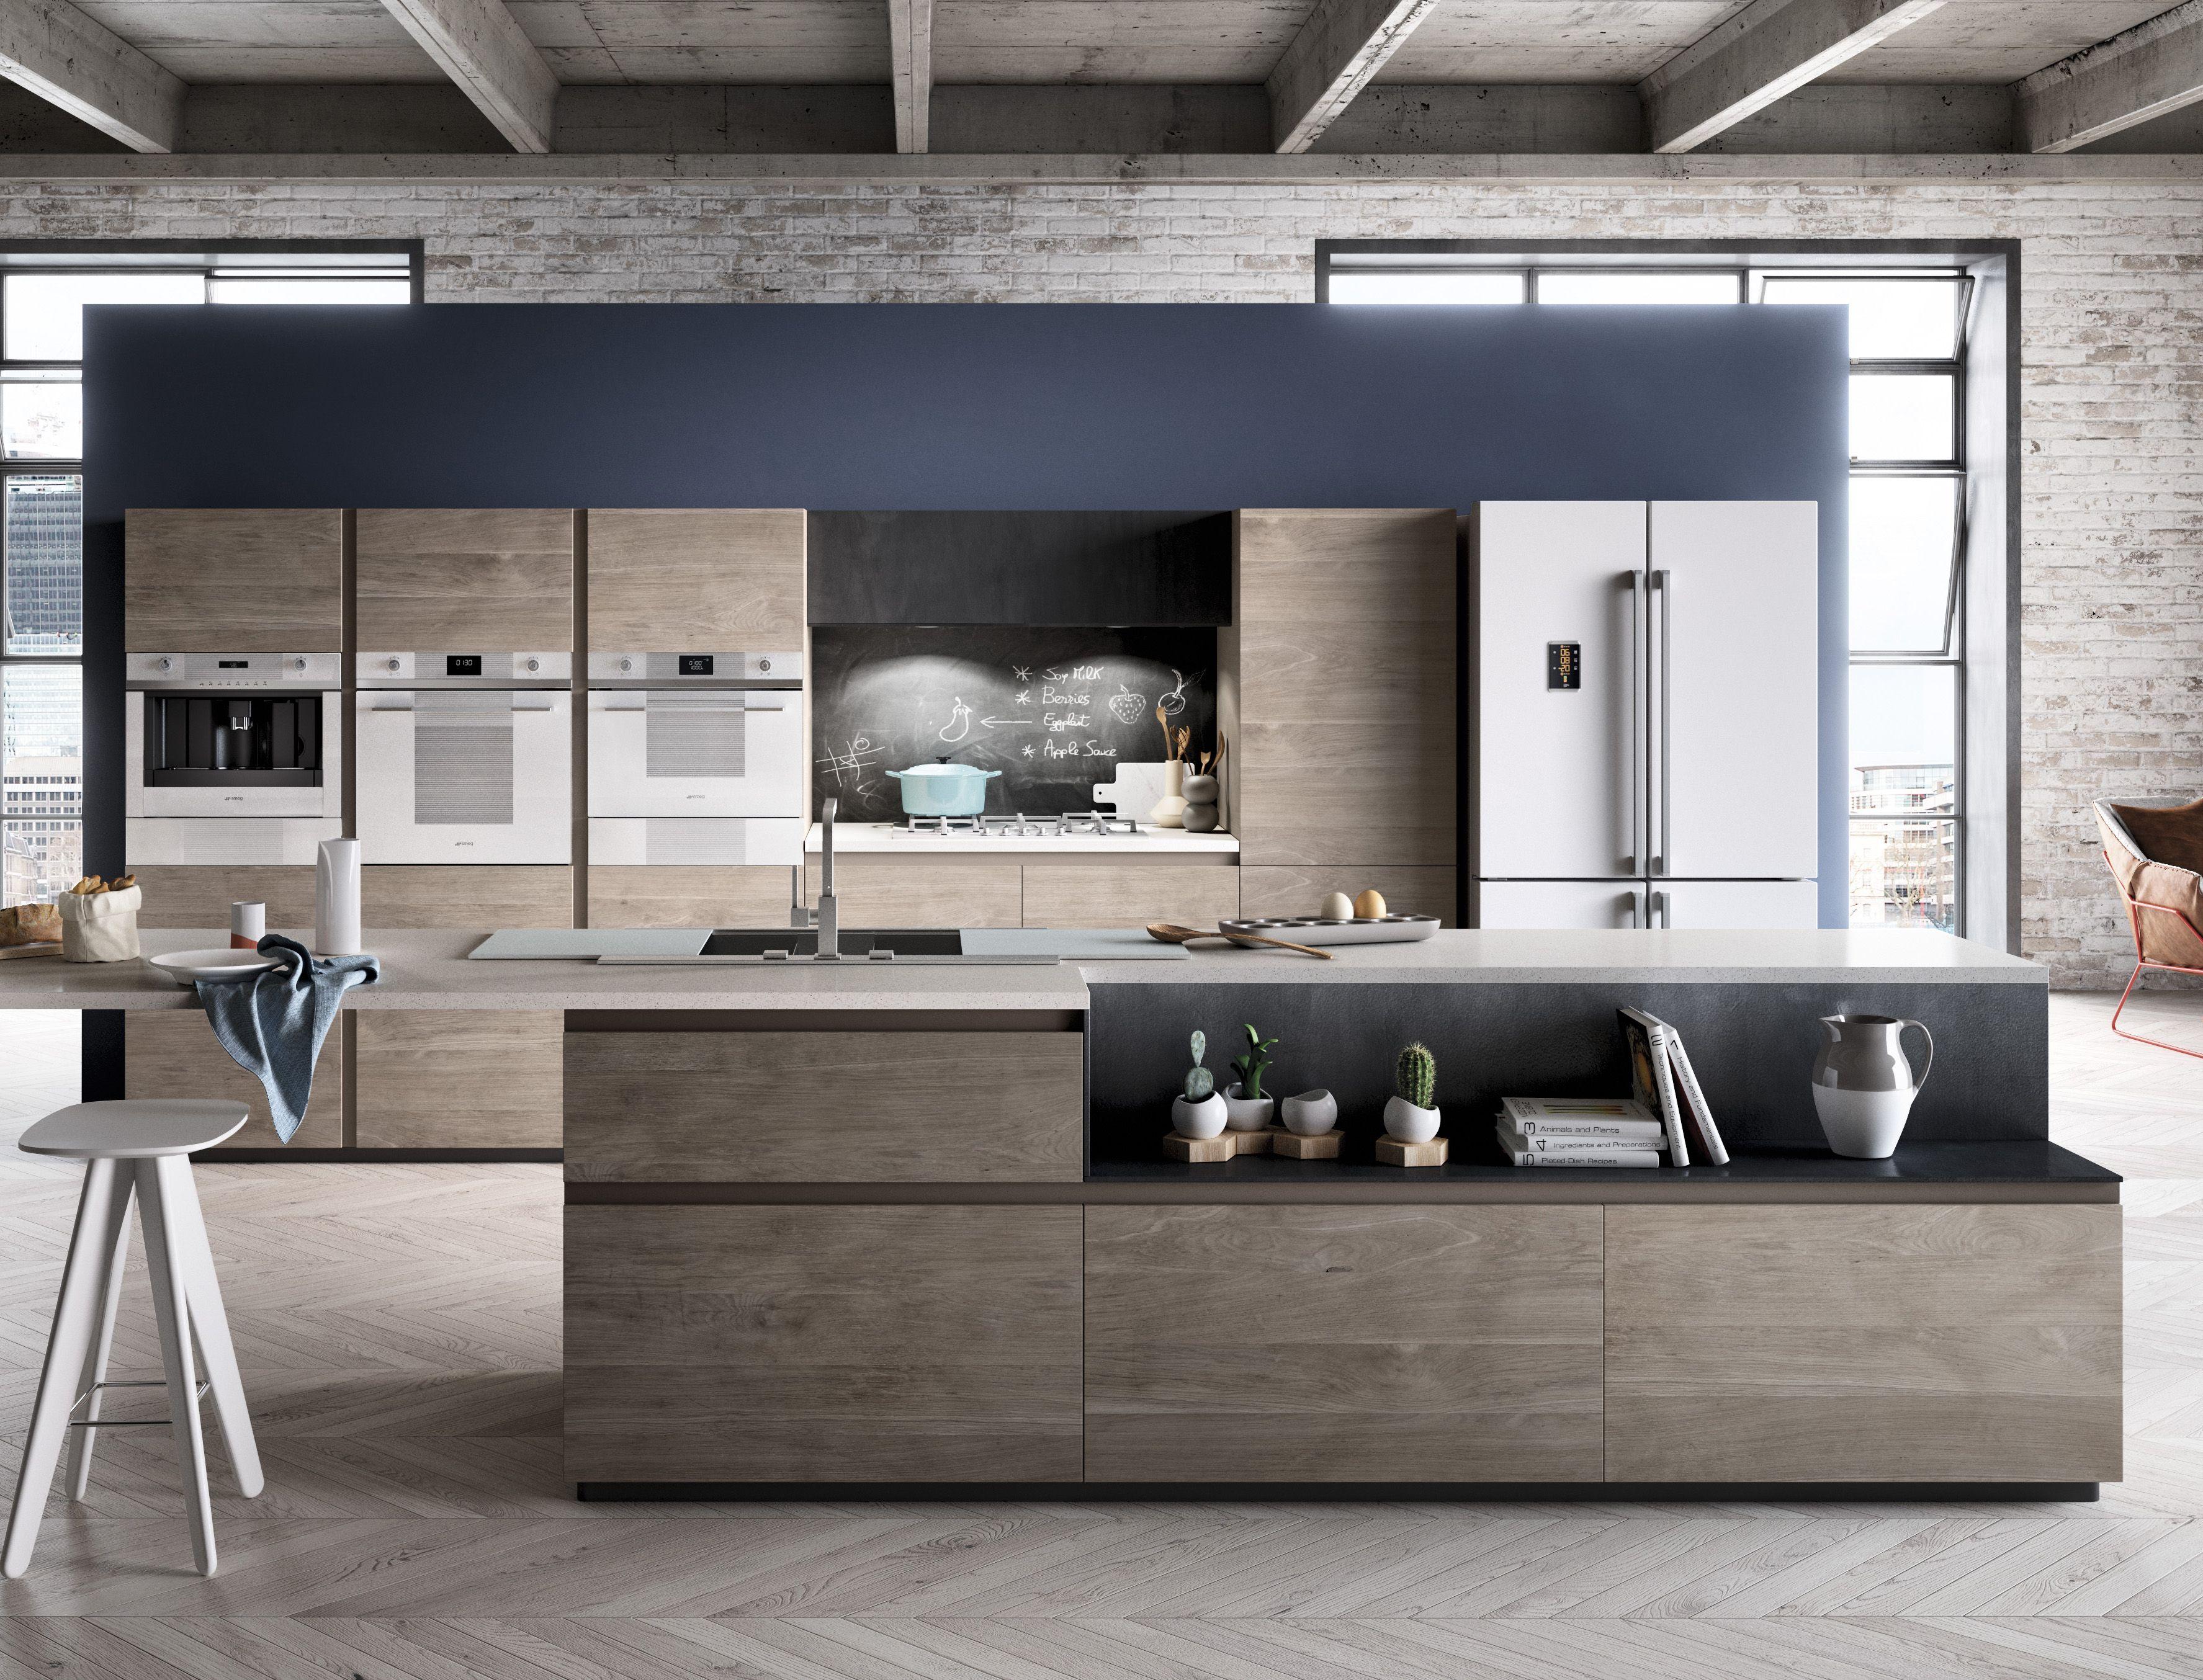 Küchen Adrian ~ Combination of white smeg linea appliances in a loft smeg